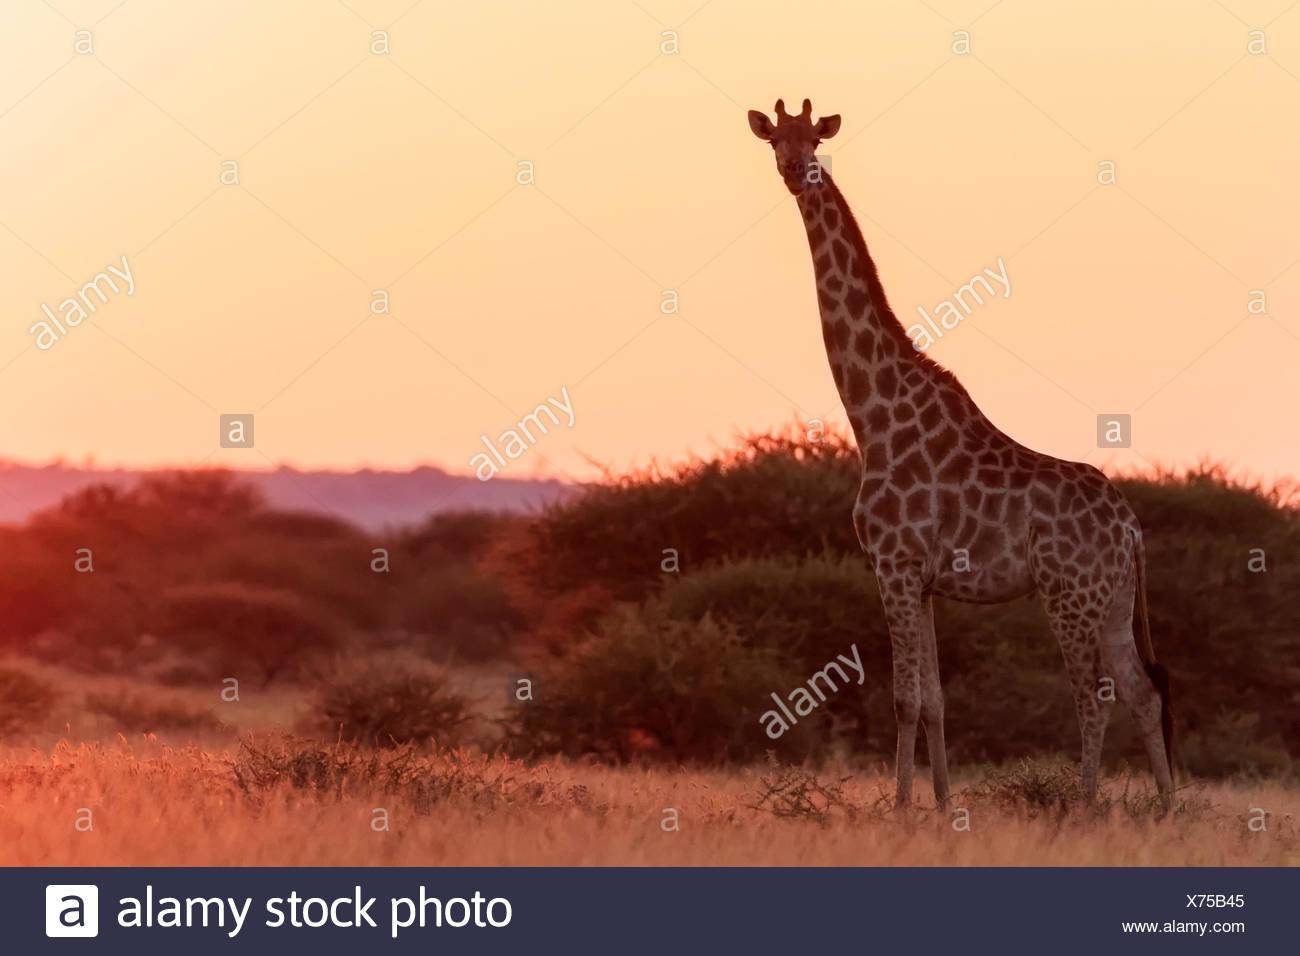 Botswana, Kalahari, Central Kalahari Game Reserve, giraffe at sunrise - Stock Image